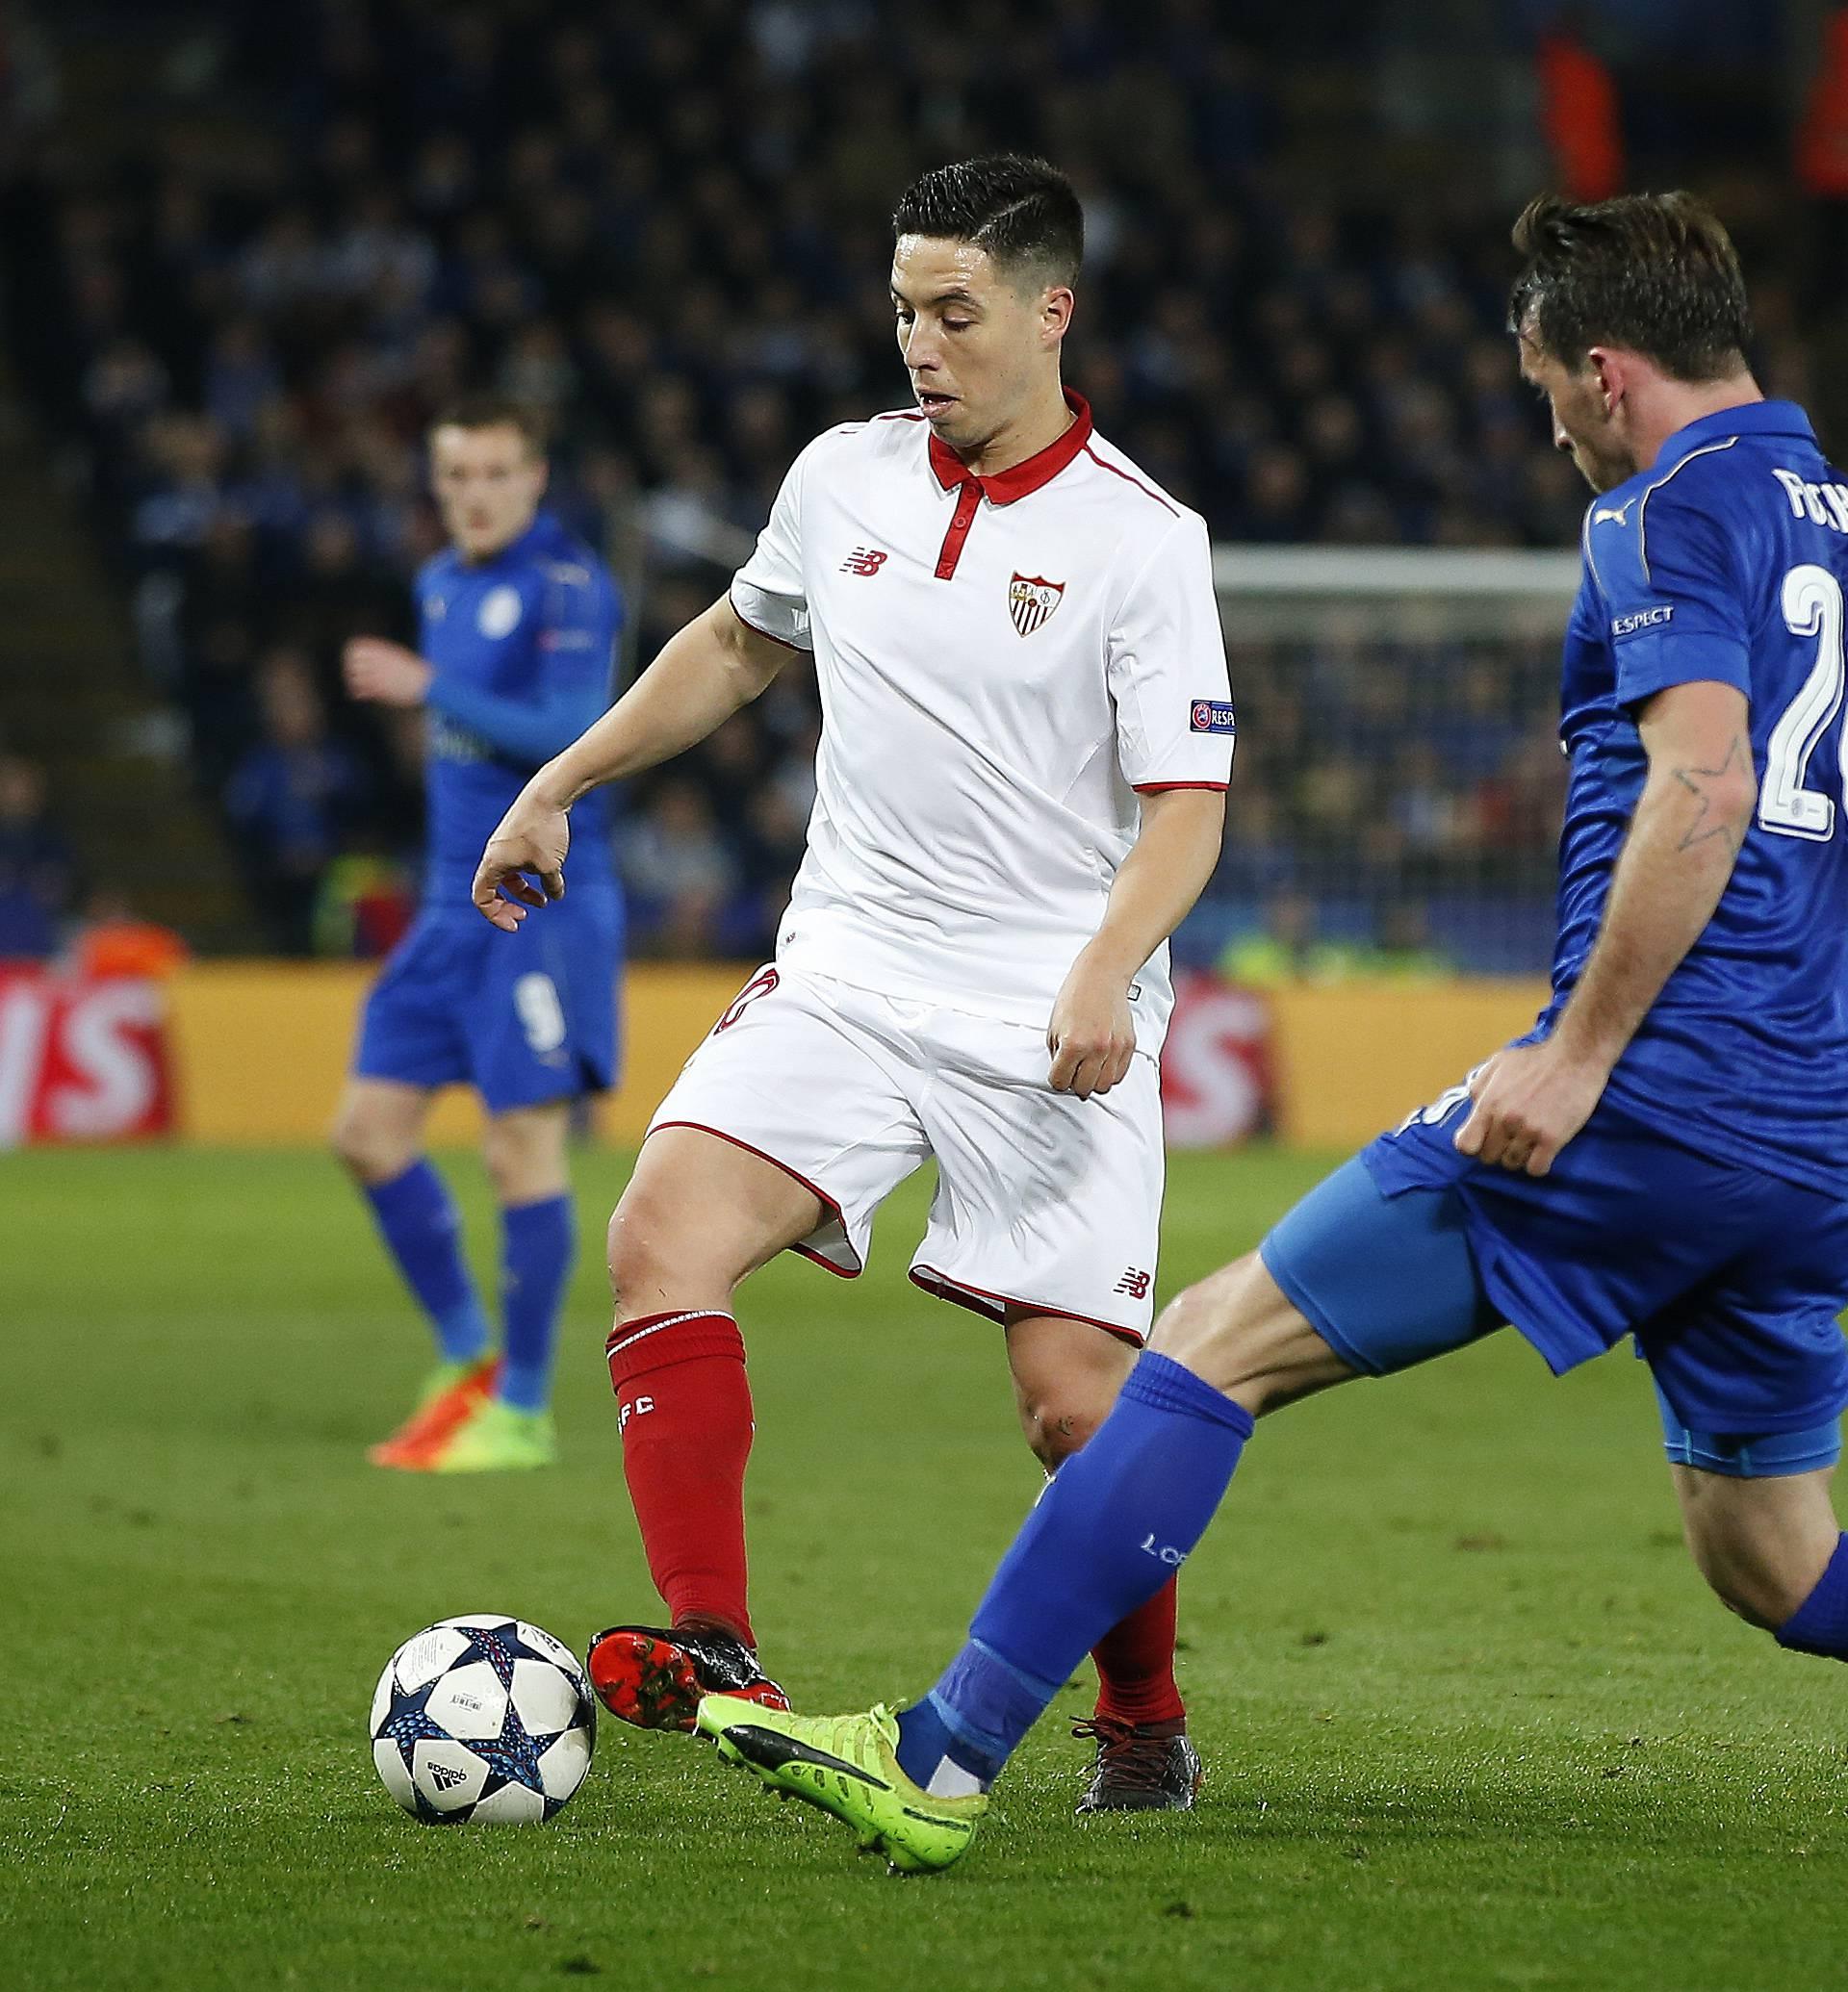 Leicester City v Sevilla - UEFA Champions League Round of 16 2nd Leg - King Power Stadium